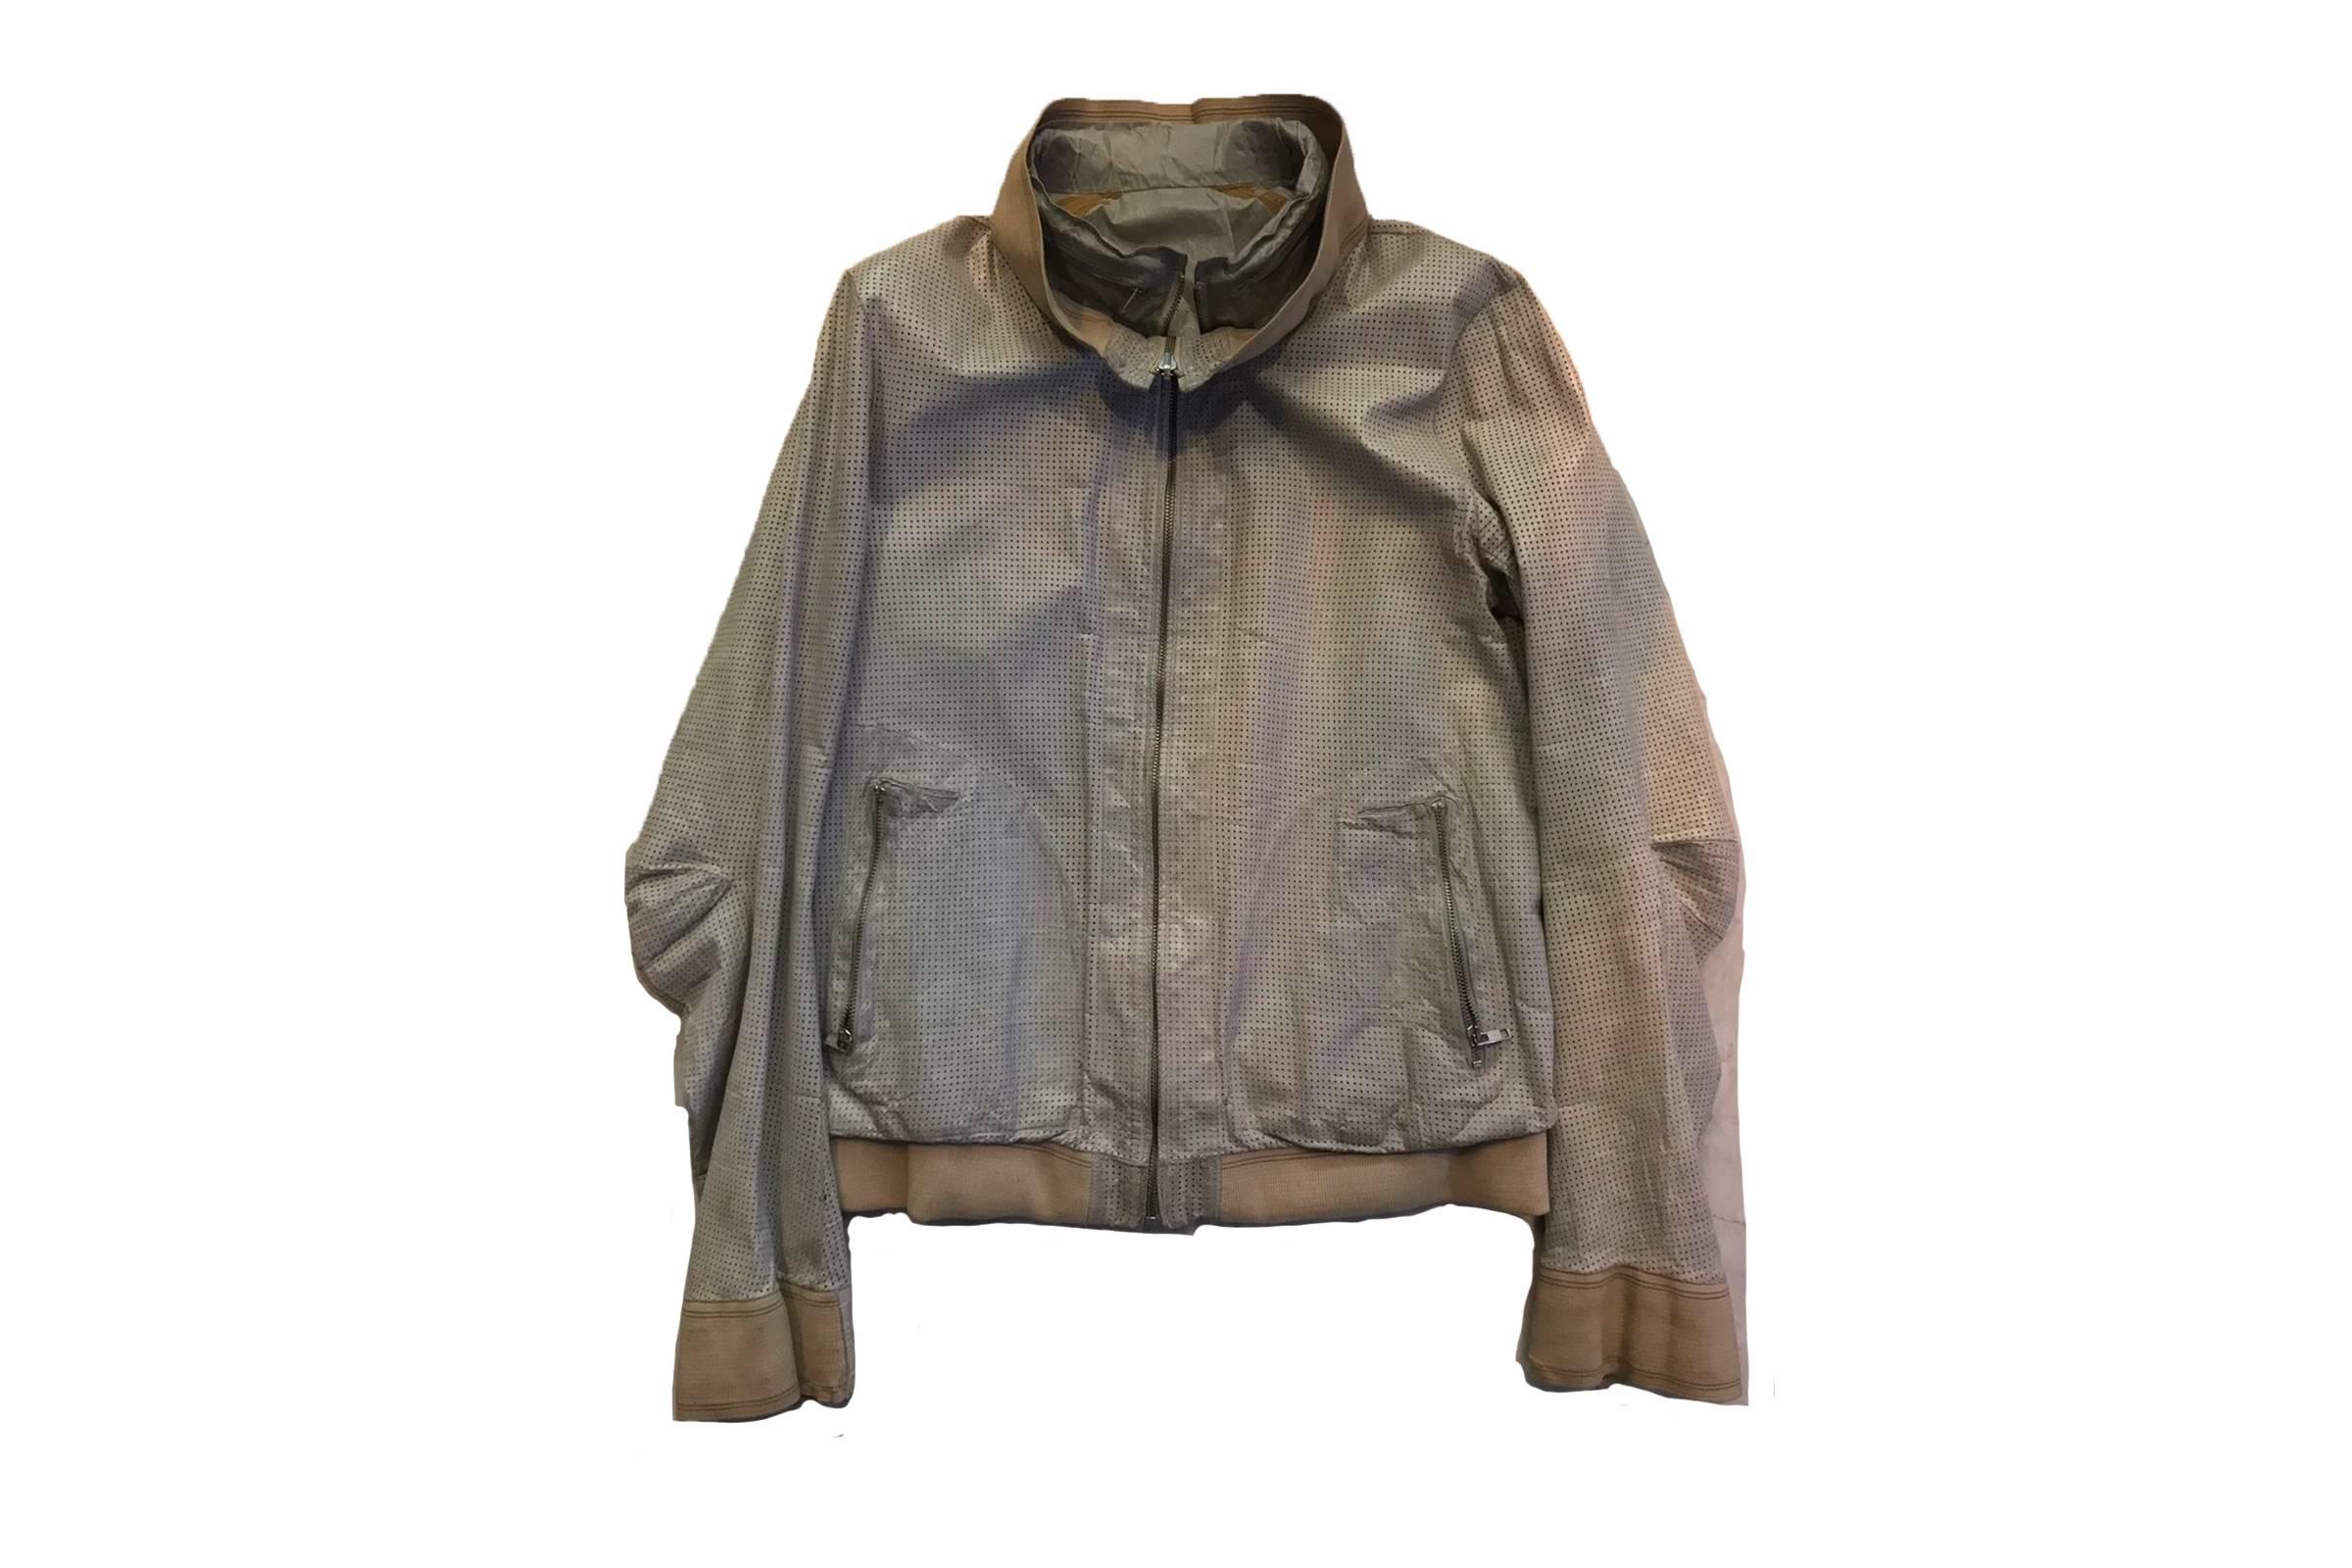 Carol Christian Poell LM/2399 Leather/Nylon Jacket